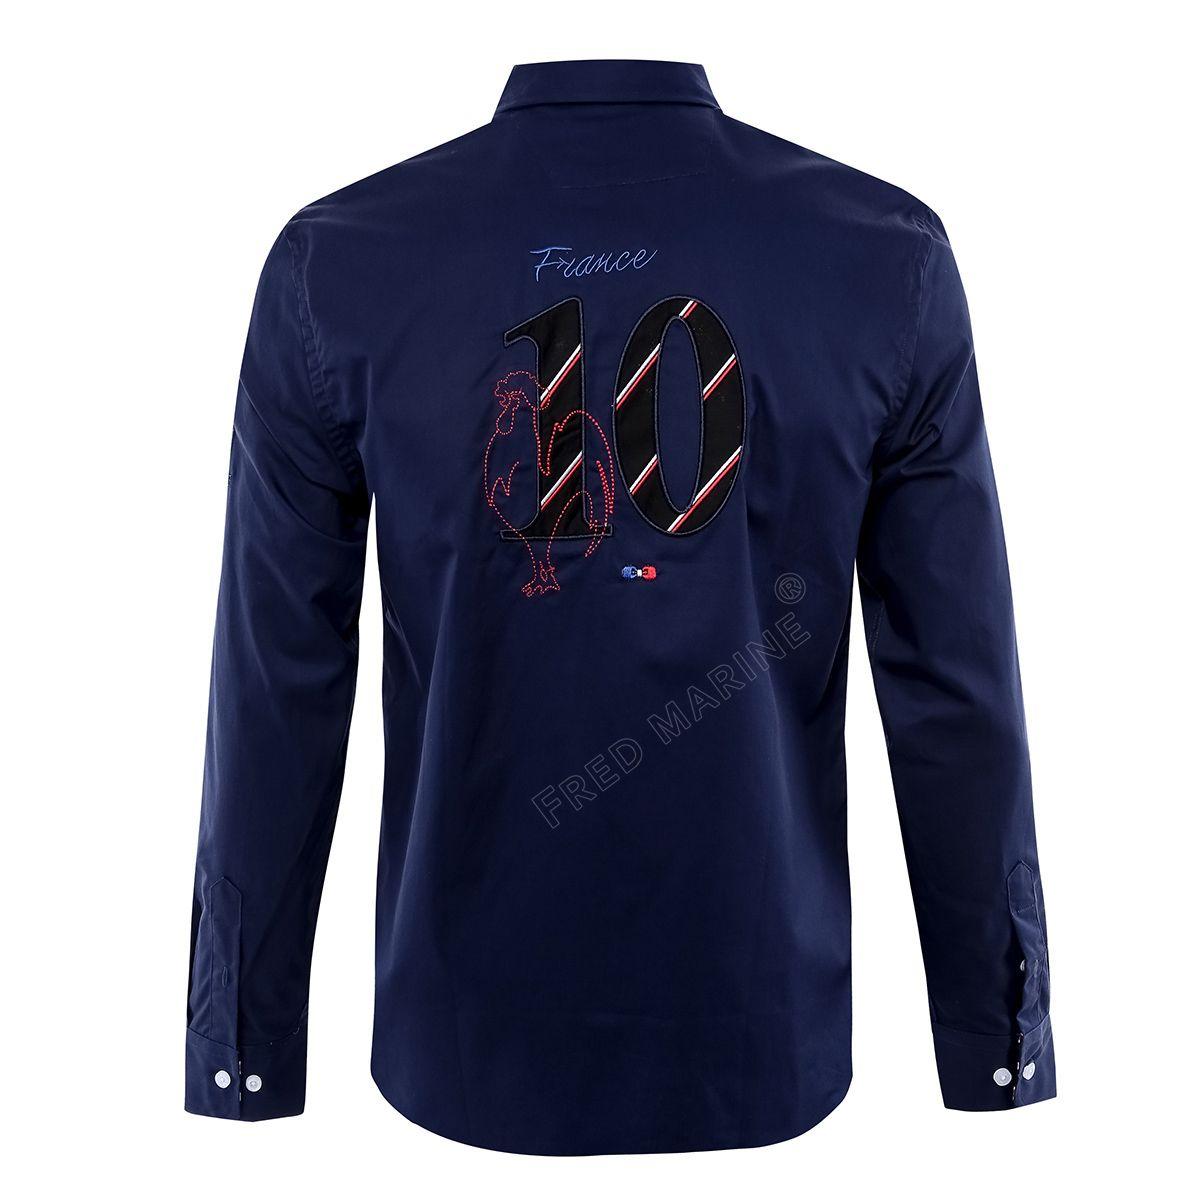 Eden park 2019 Leisure Pure Cotton in cotone girocollo Camicia blu For Foreign Number Number t-shirt henley camicia da uomo d'affari